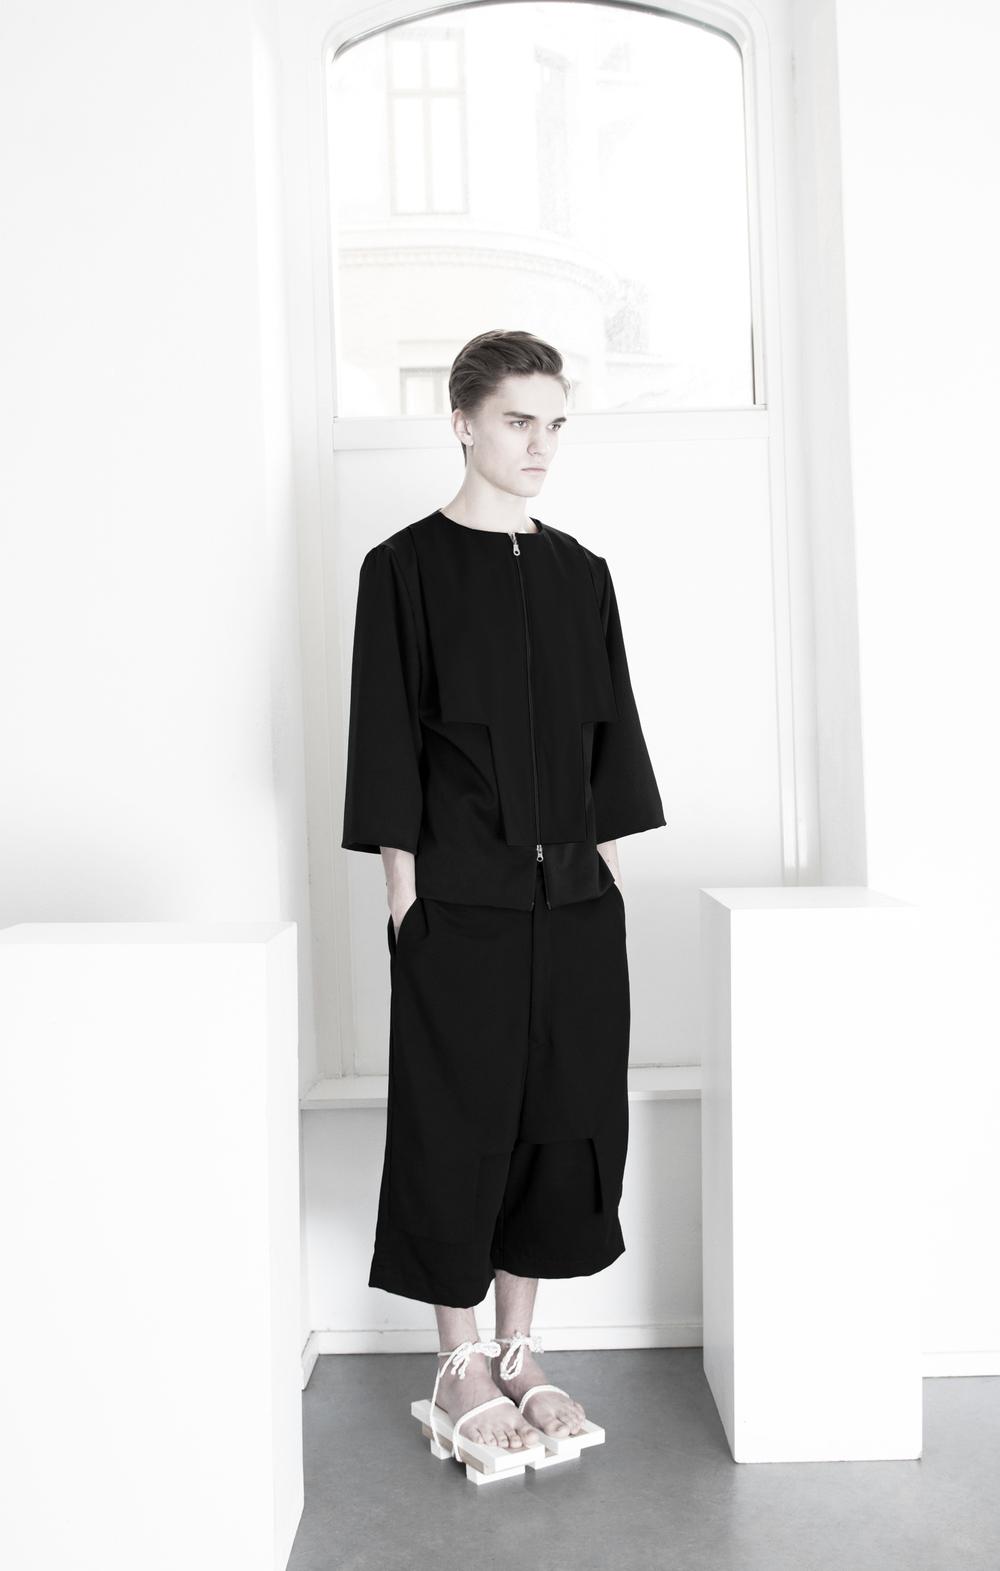 Hin-Jacket-Menswear-3.jpg